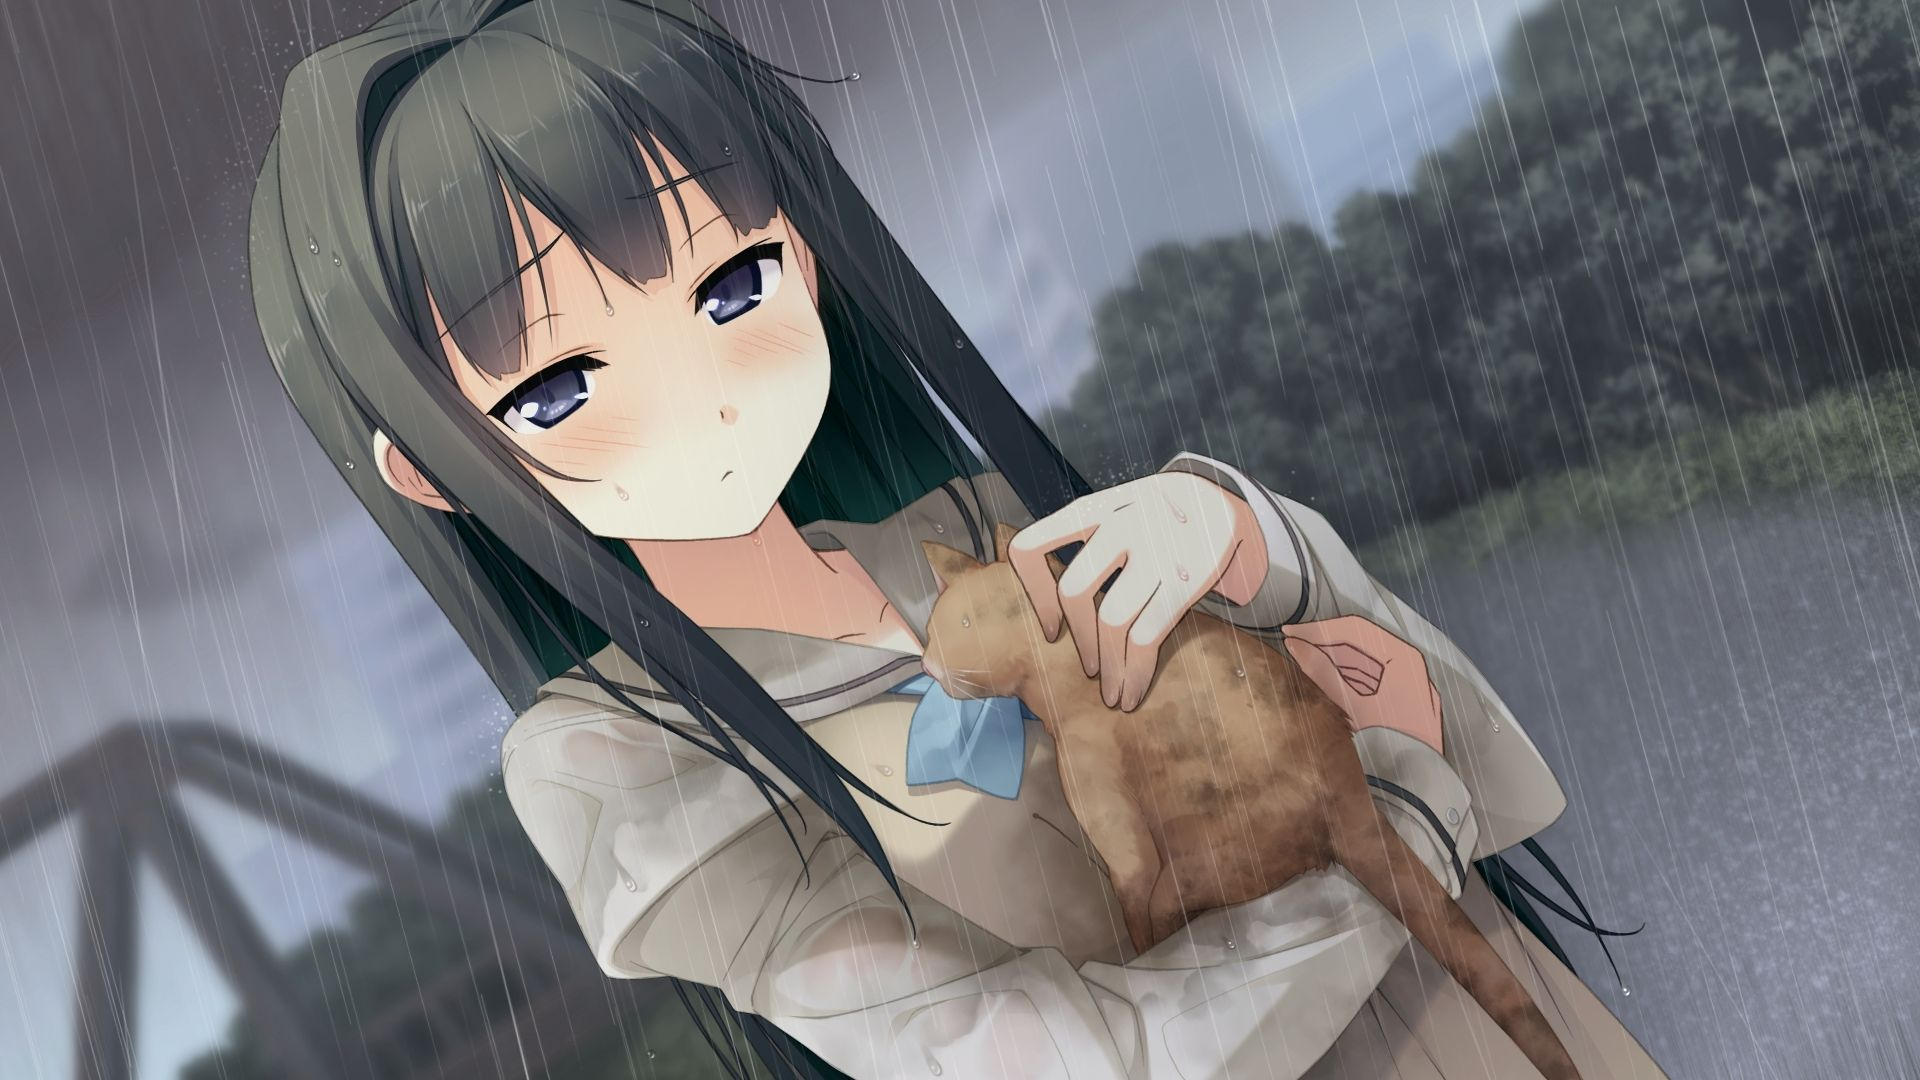 Rain Sad Anime Wallpapers - Top Free Rain Sad Anime ...